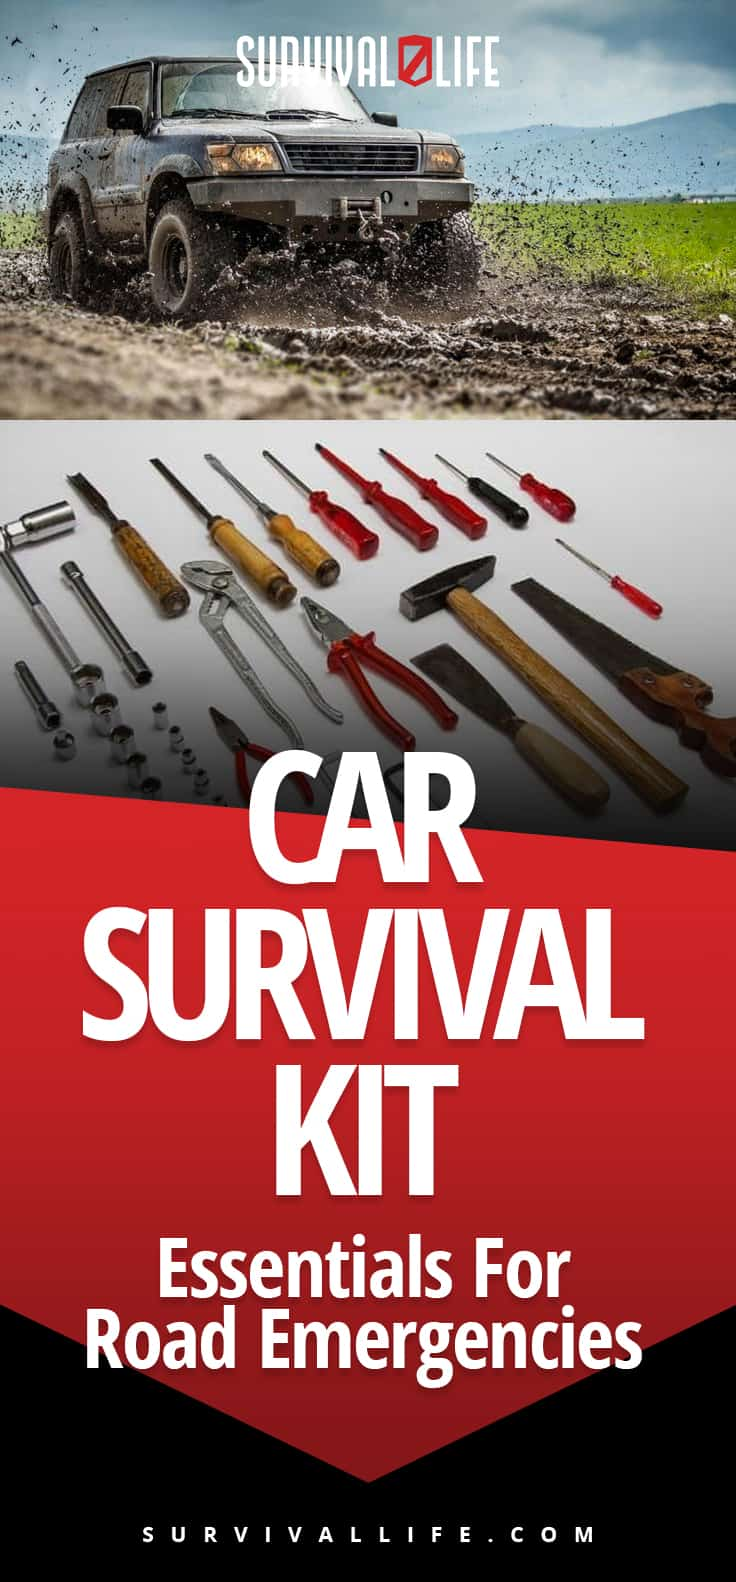 Car Survival Kit Essentials For Road Emergencies | car survival kit list